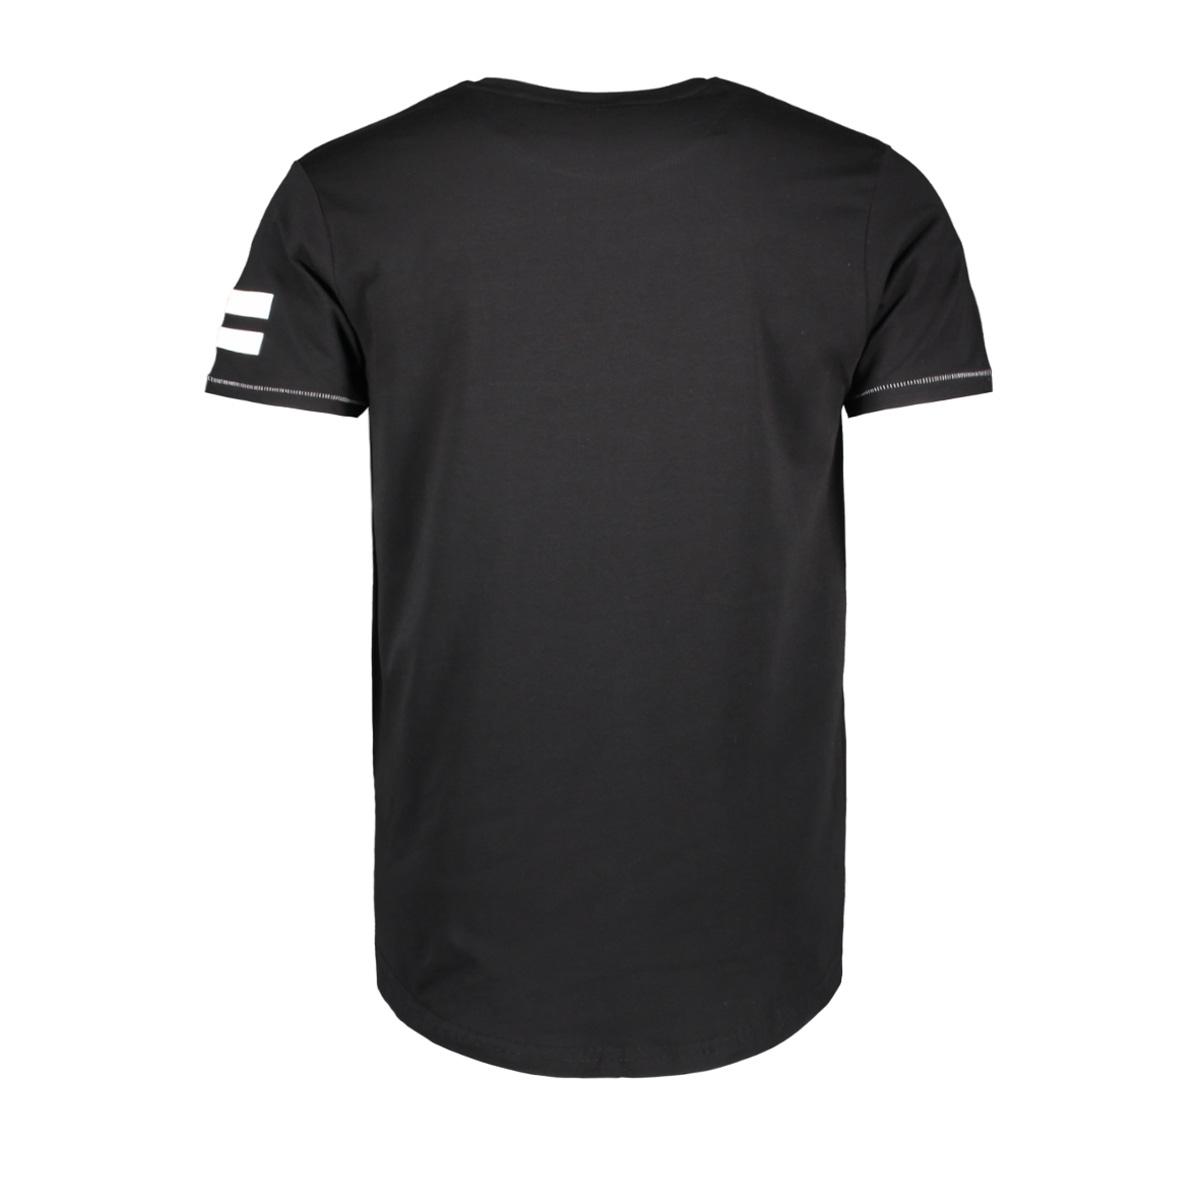 13859 gabbiano t-shirt black